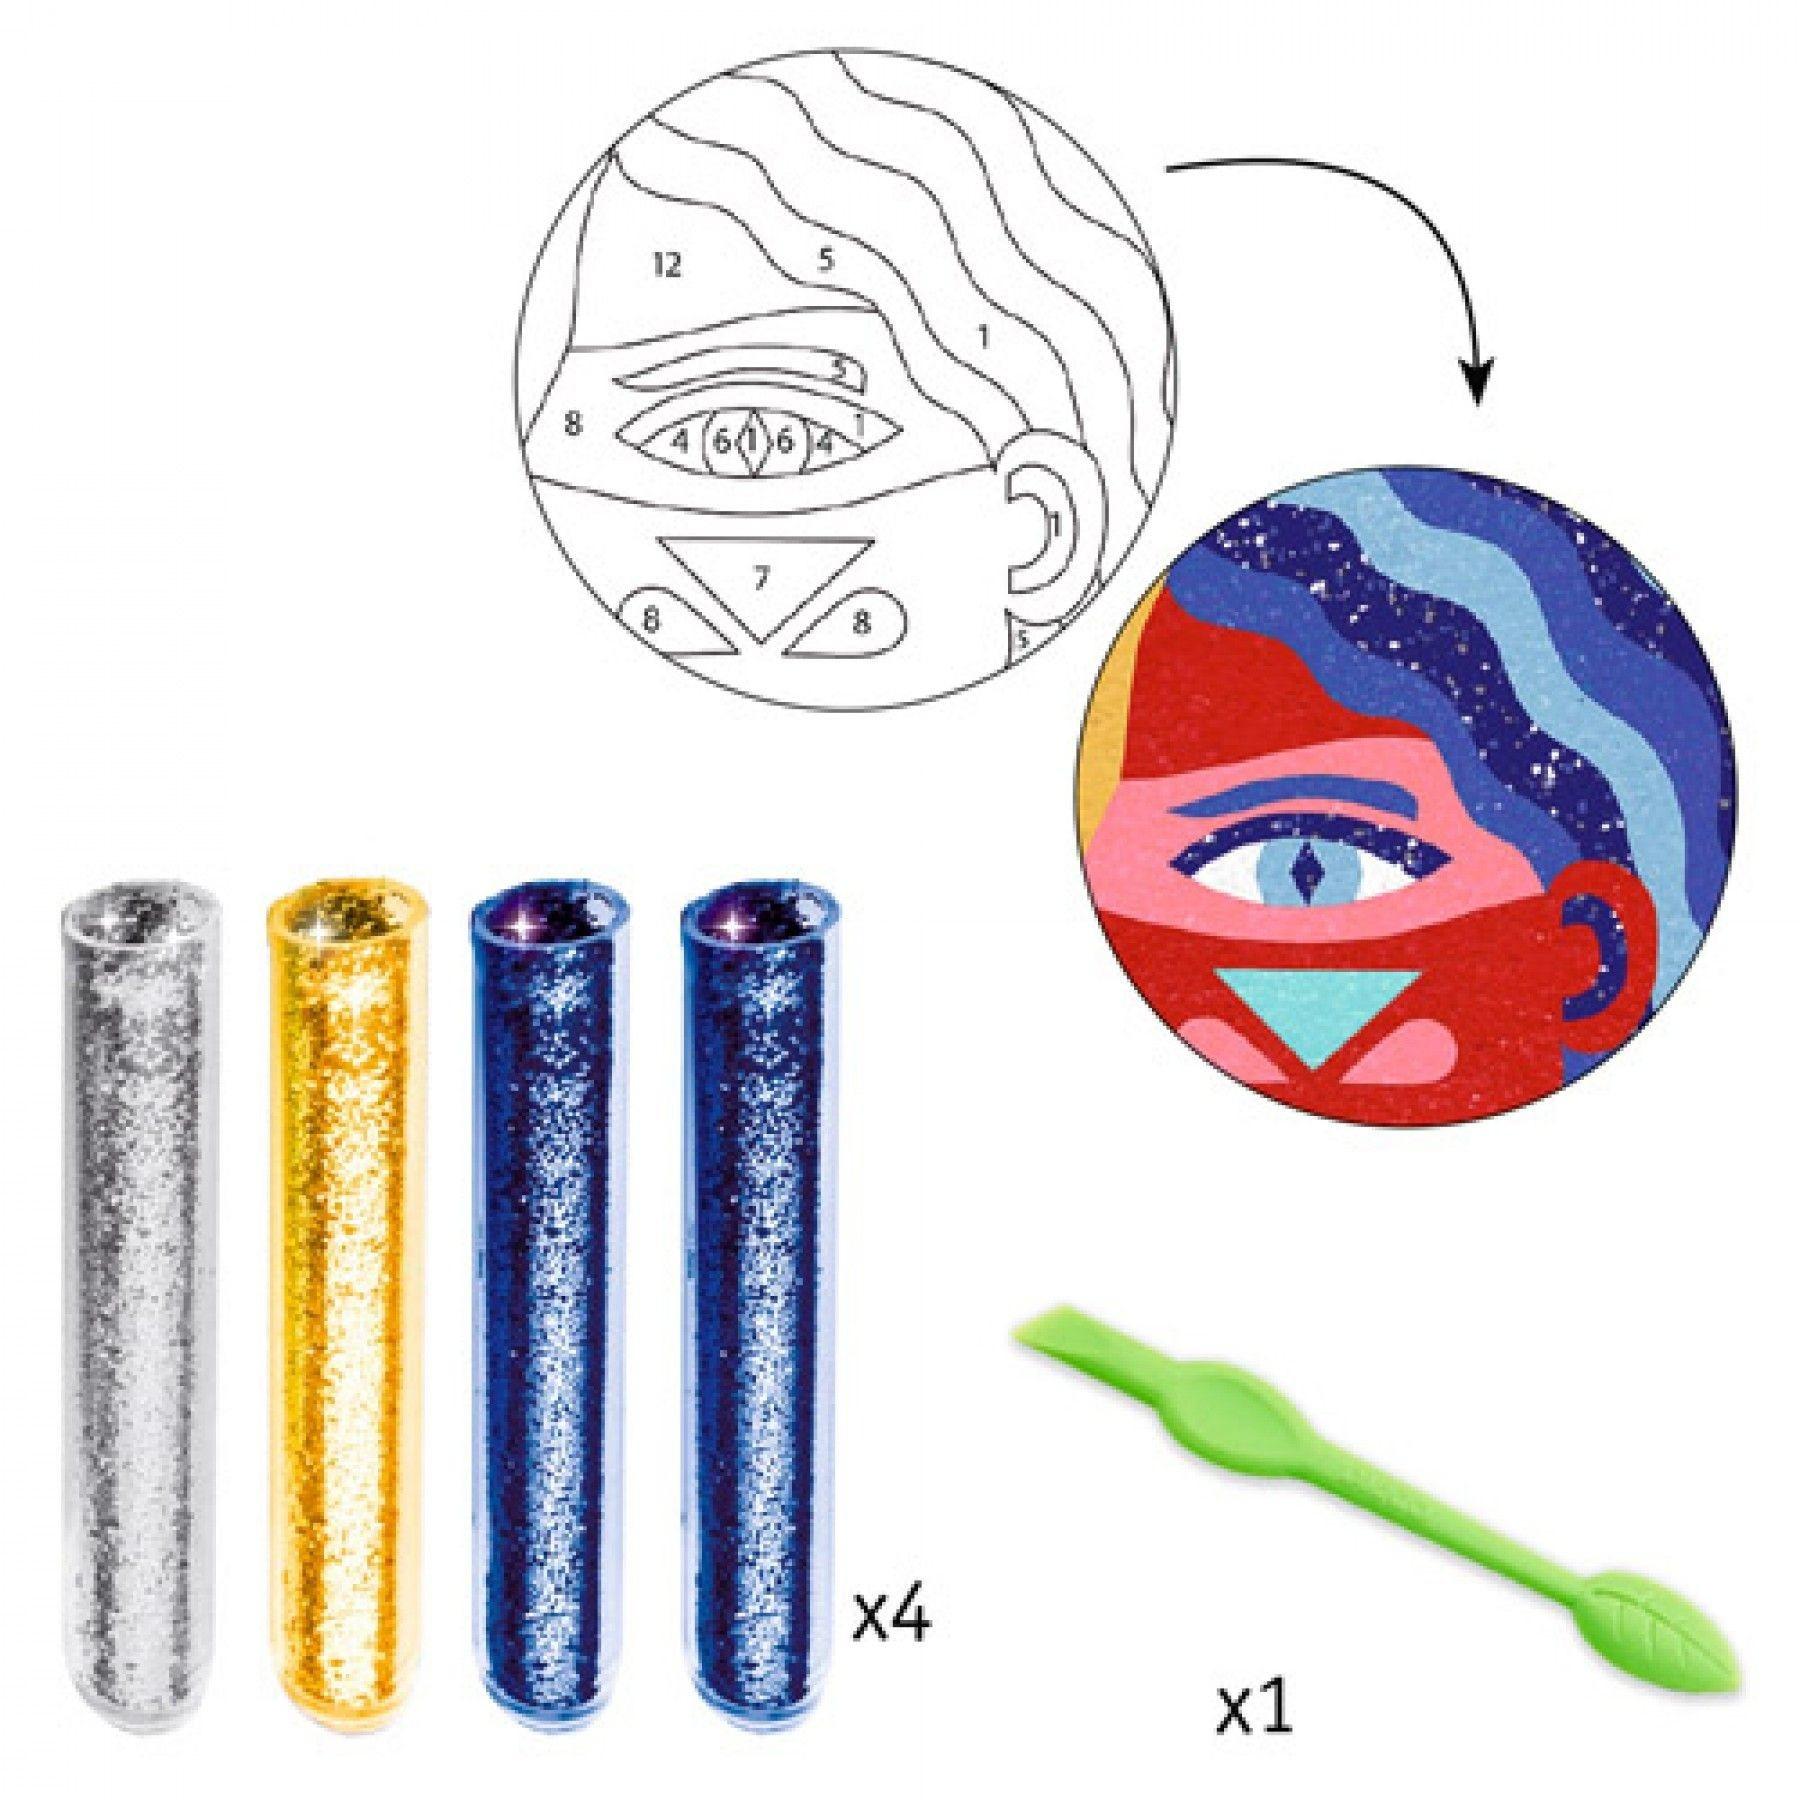 Djeco Djeco DIY Workshop Zand & Glitter - Totemdier 8-14Y